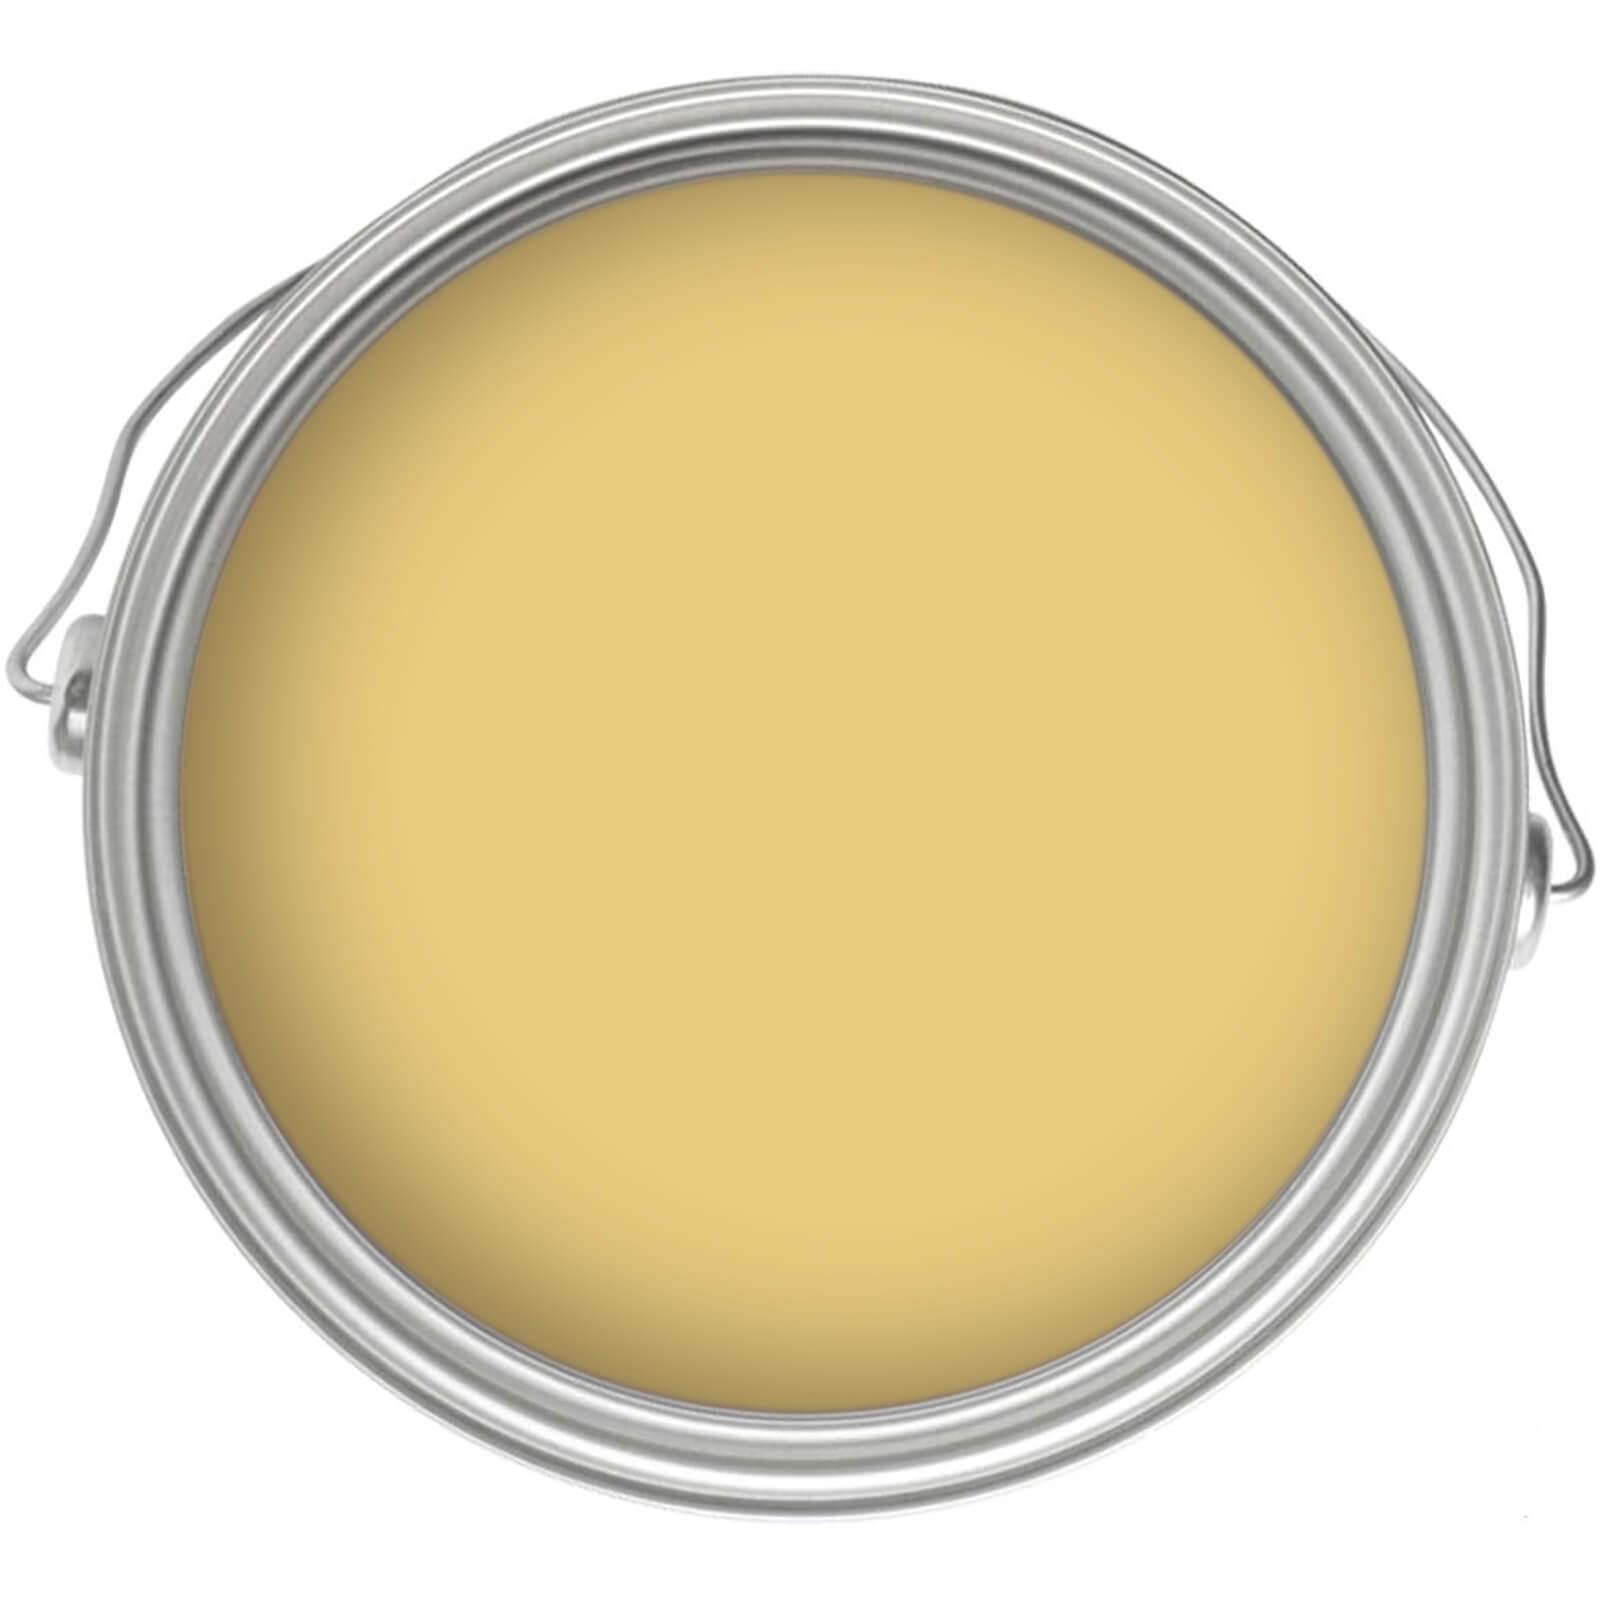 Craig & Rose 1829 Chalky Emulsion - Gloriana 50ml